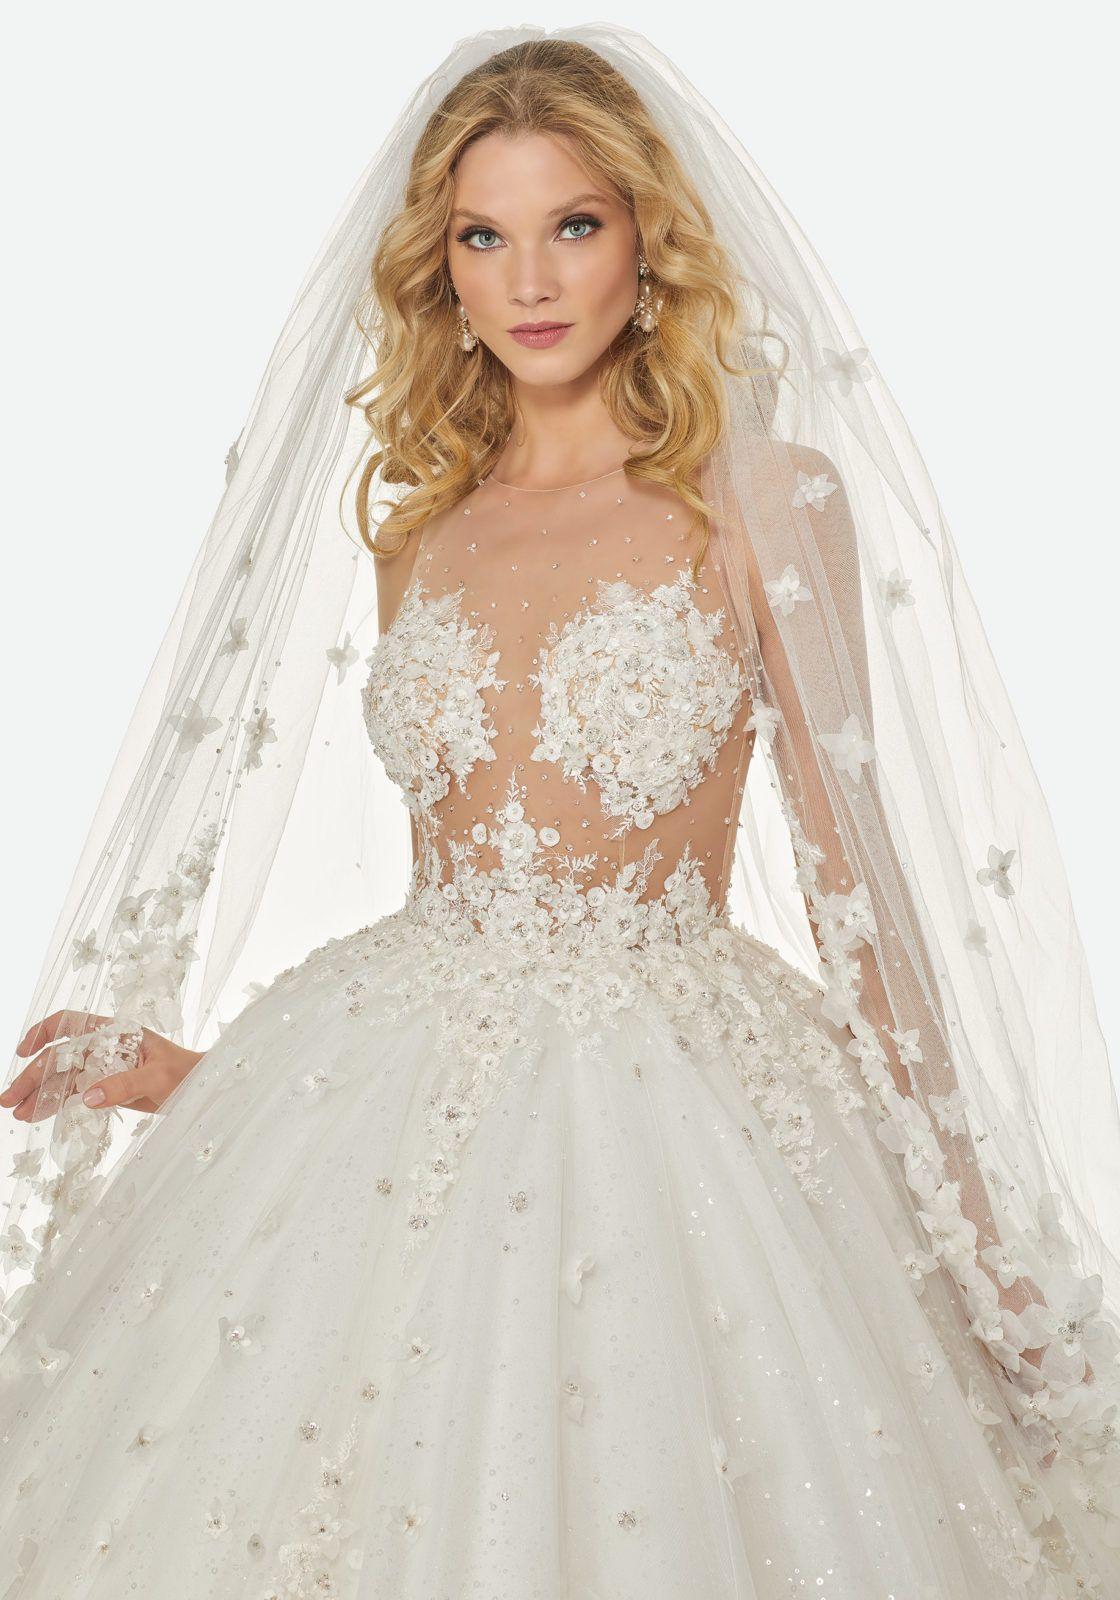 Brandi Wedding Dress | Randy Fenoli Bridal | Fátyol/Veil | Pinterest ...